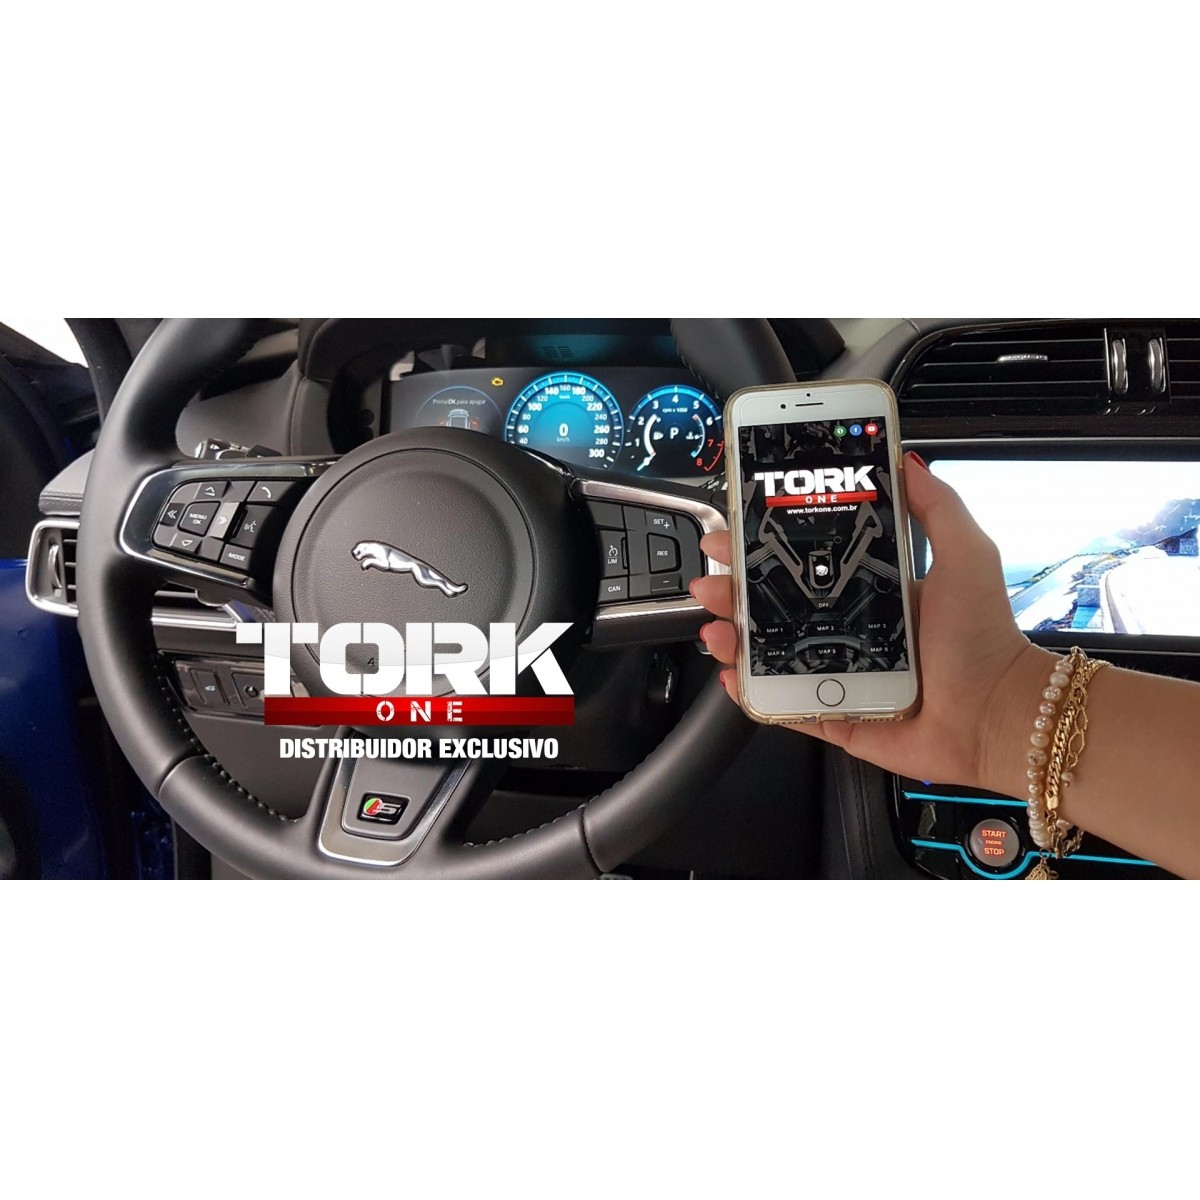 Gás Pedal - Toyota - Tork One c/s Bluetooth